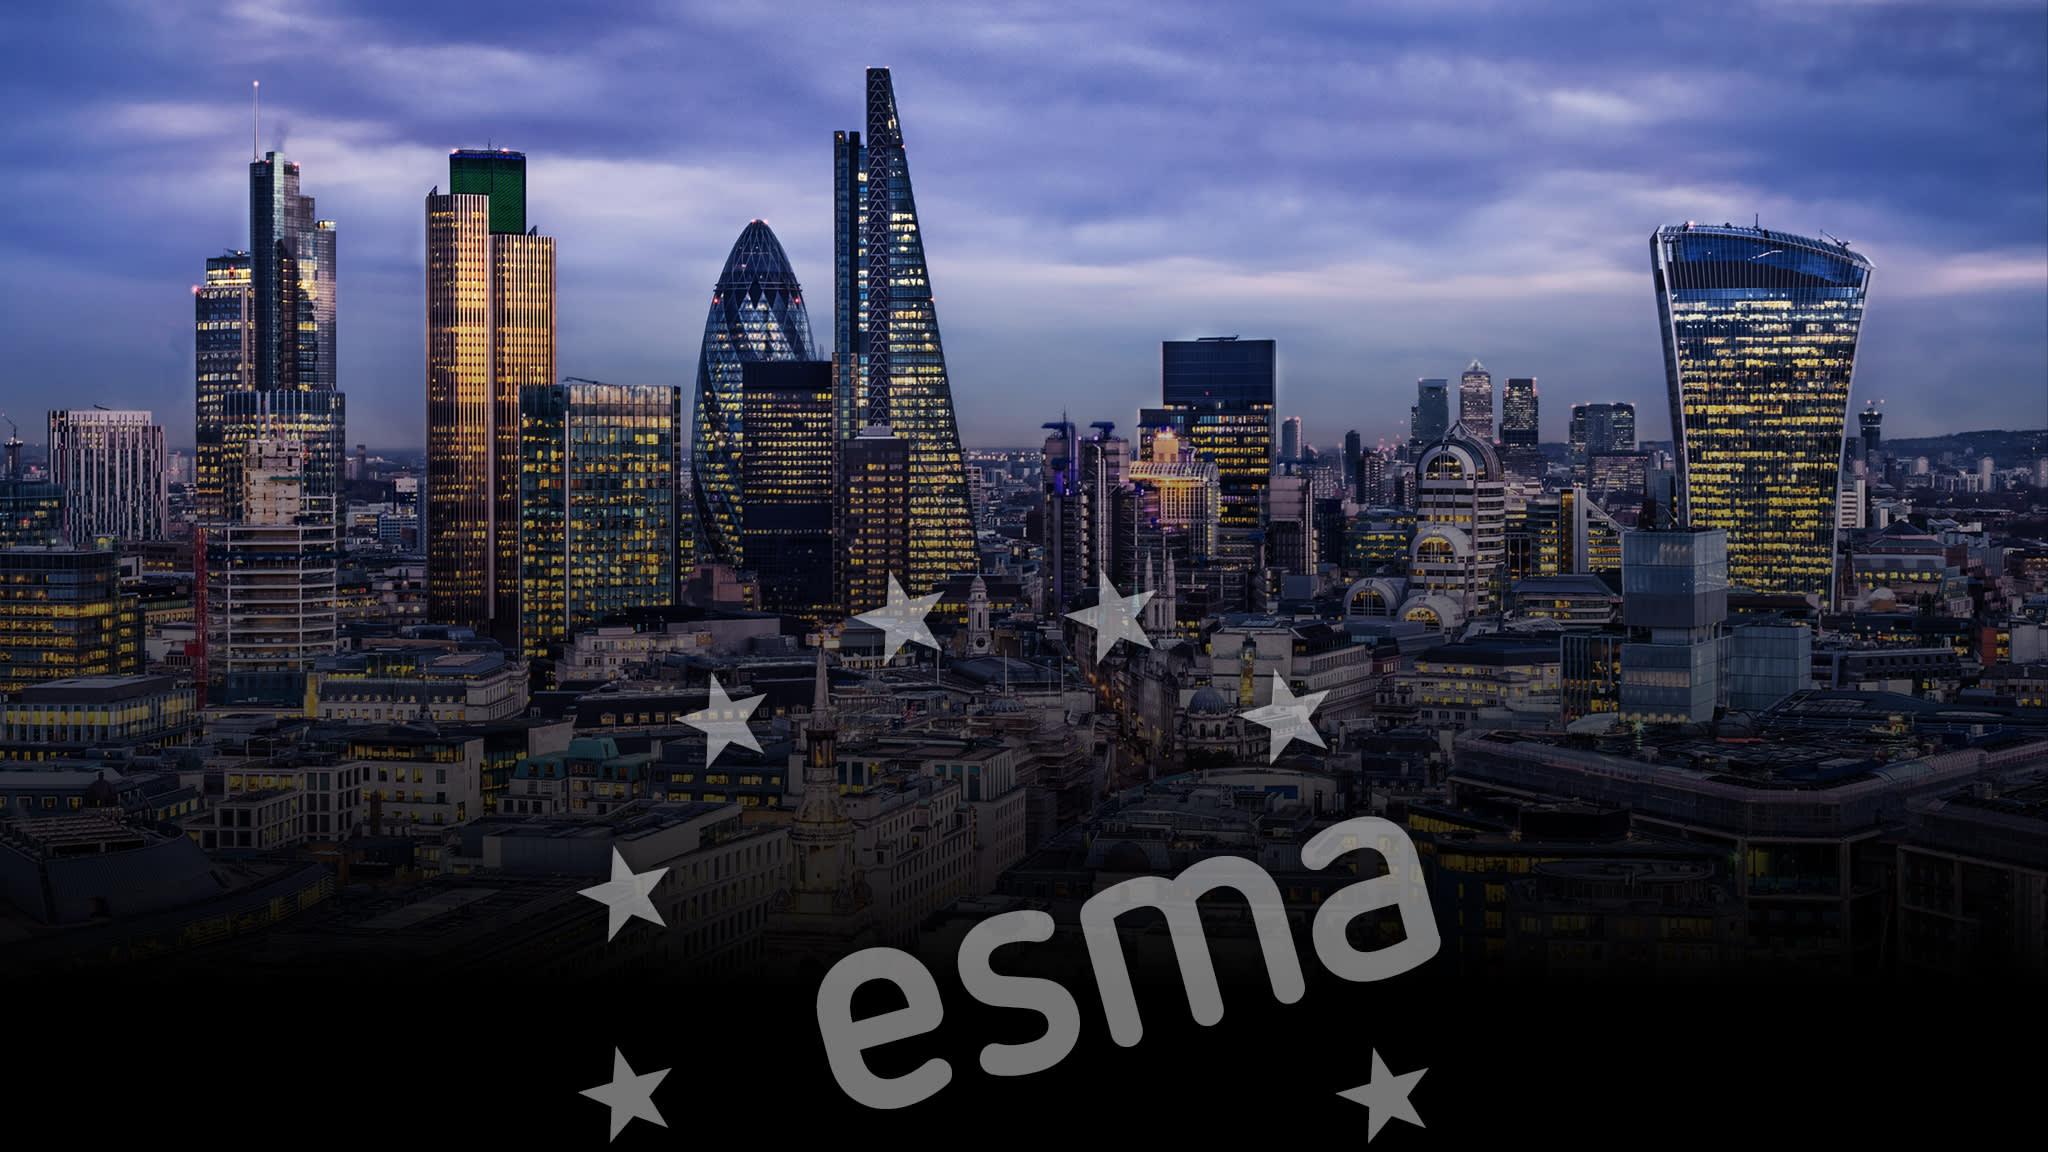 Hundreds of European stocks barred from dark pools